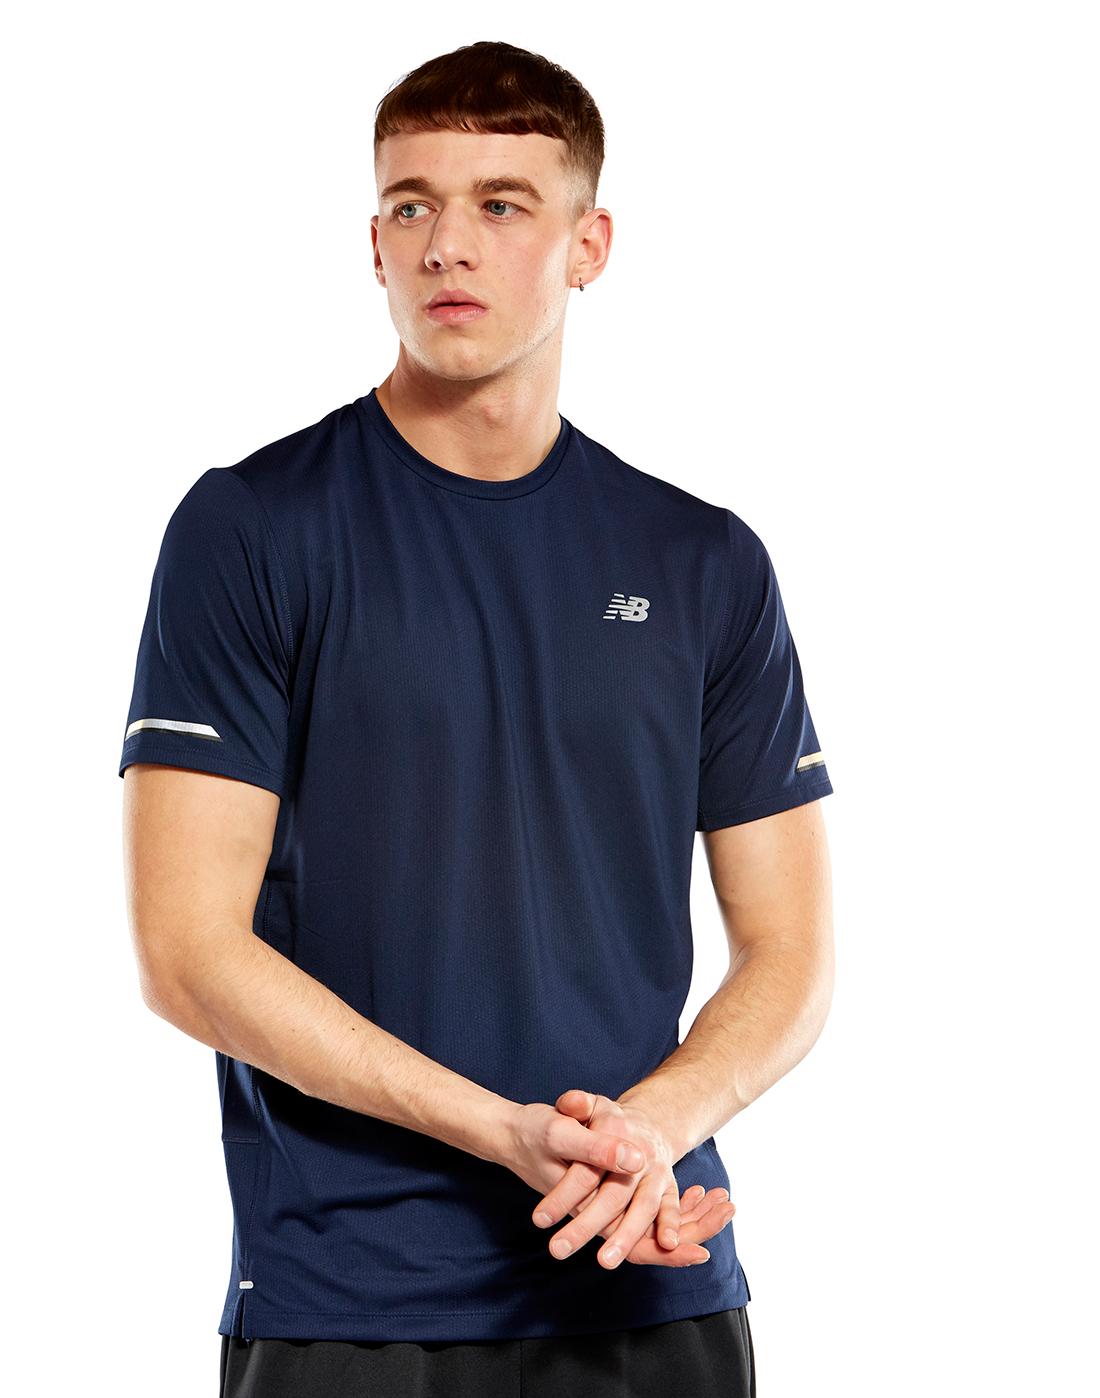 91be5ee54b1d6 Men's Navy New Balance T-Shirt   Life Style Sports